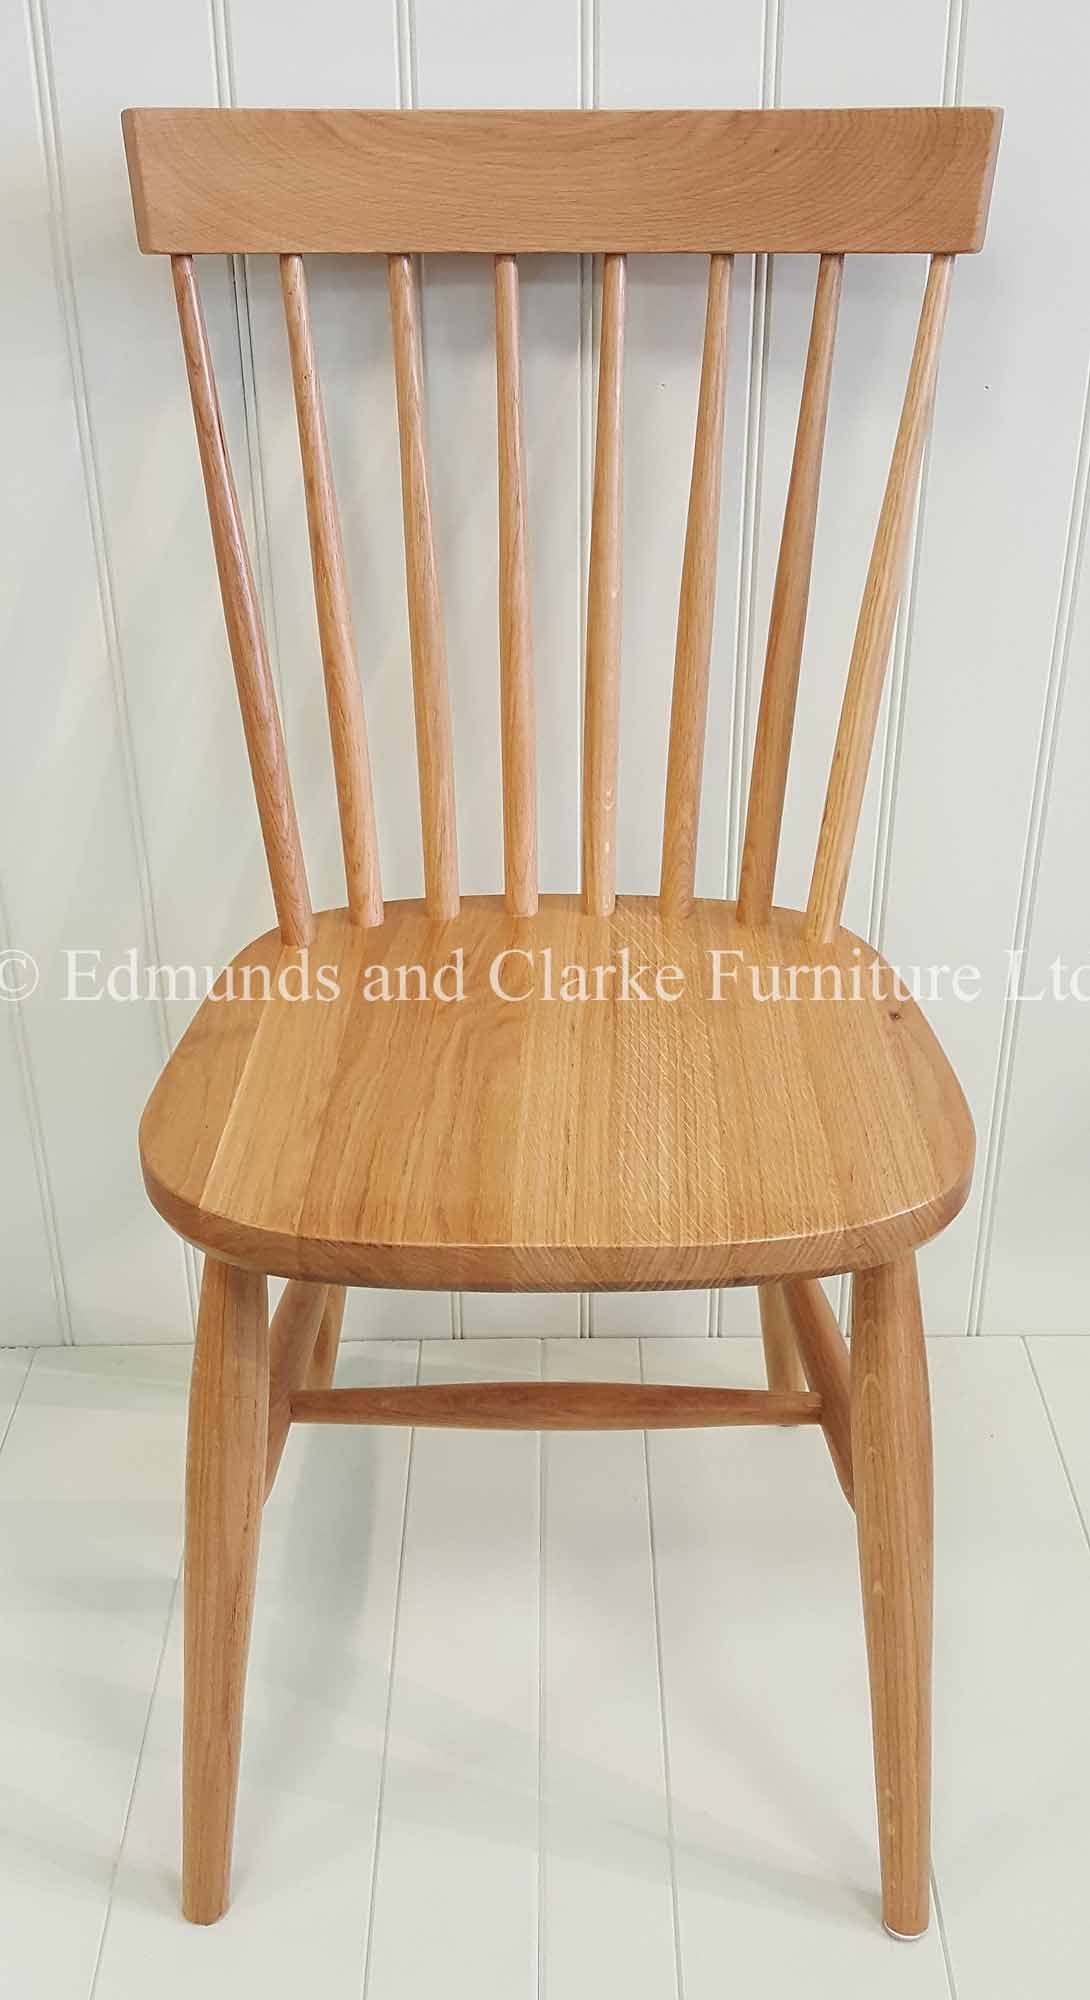 Edmunds nordic oak scandinavian style dining chair